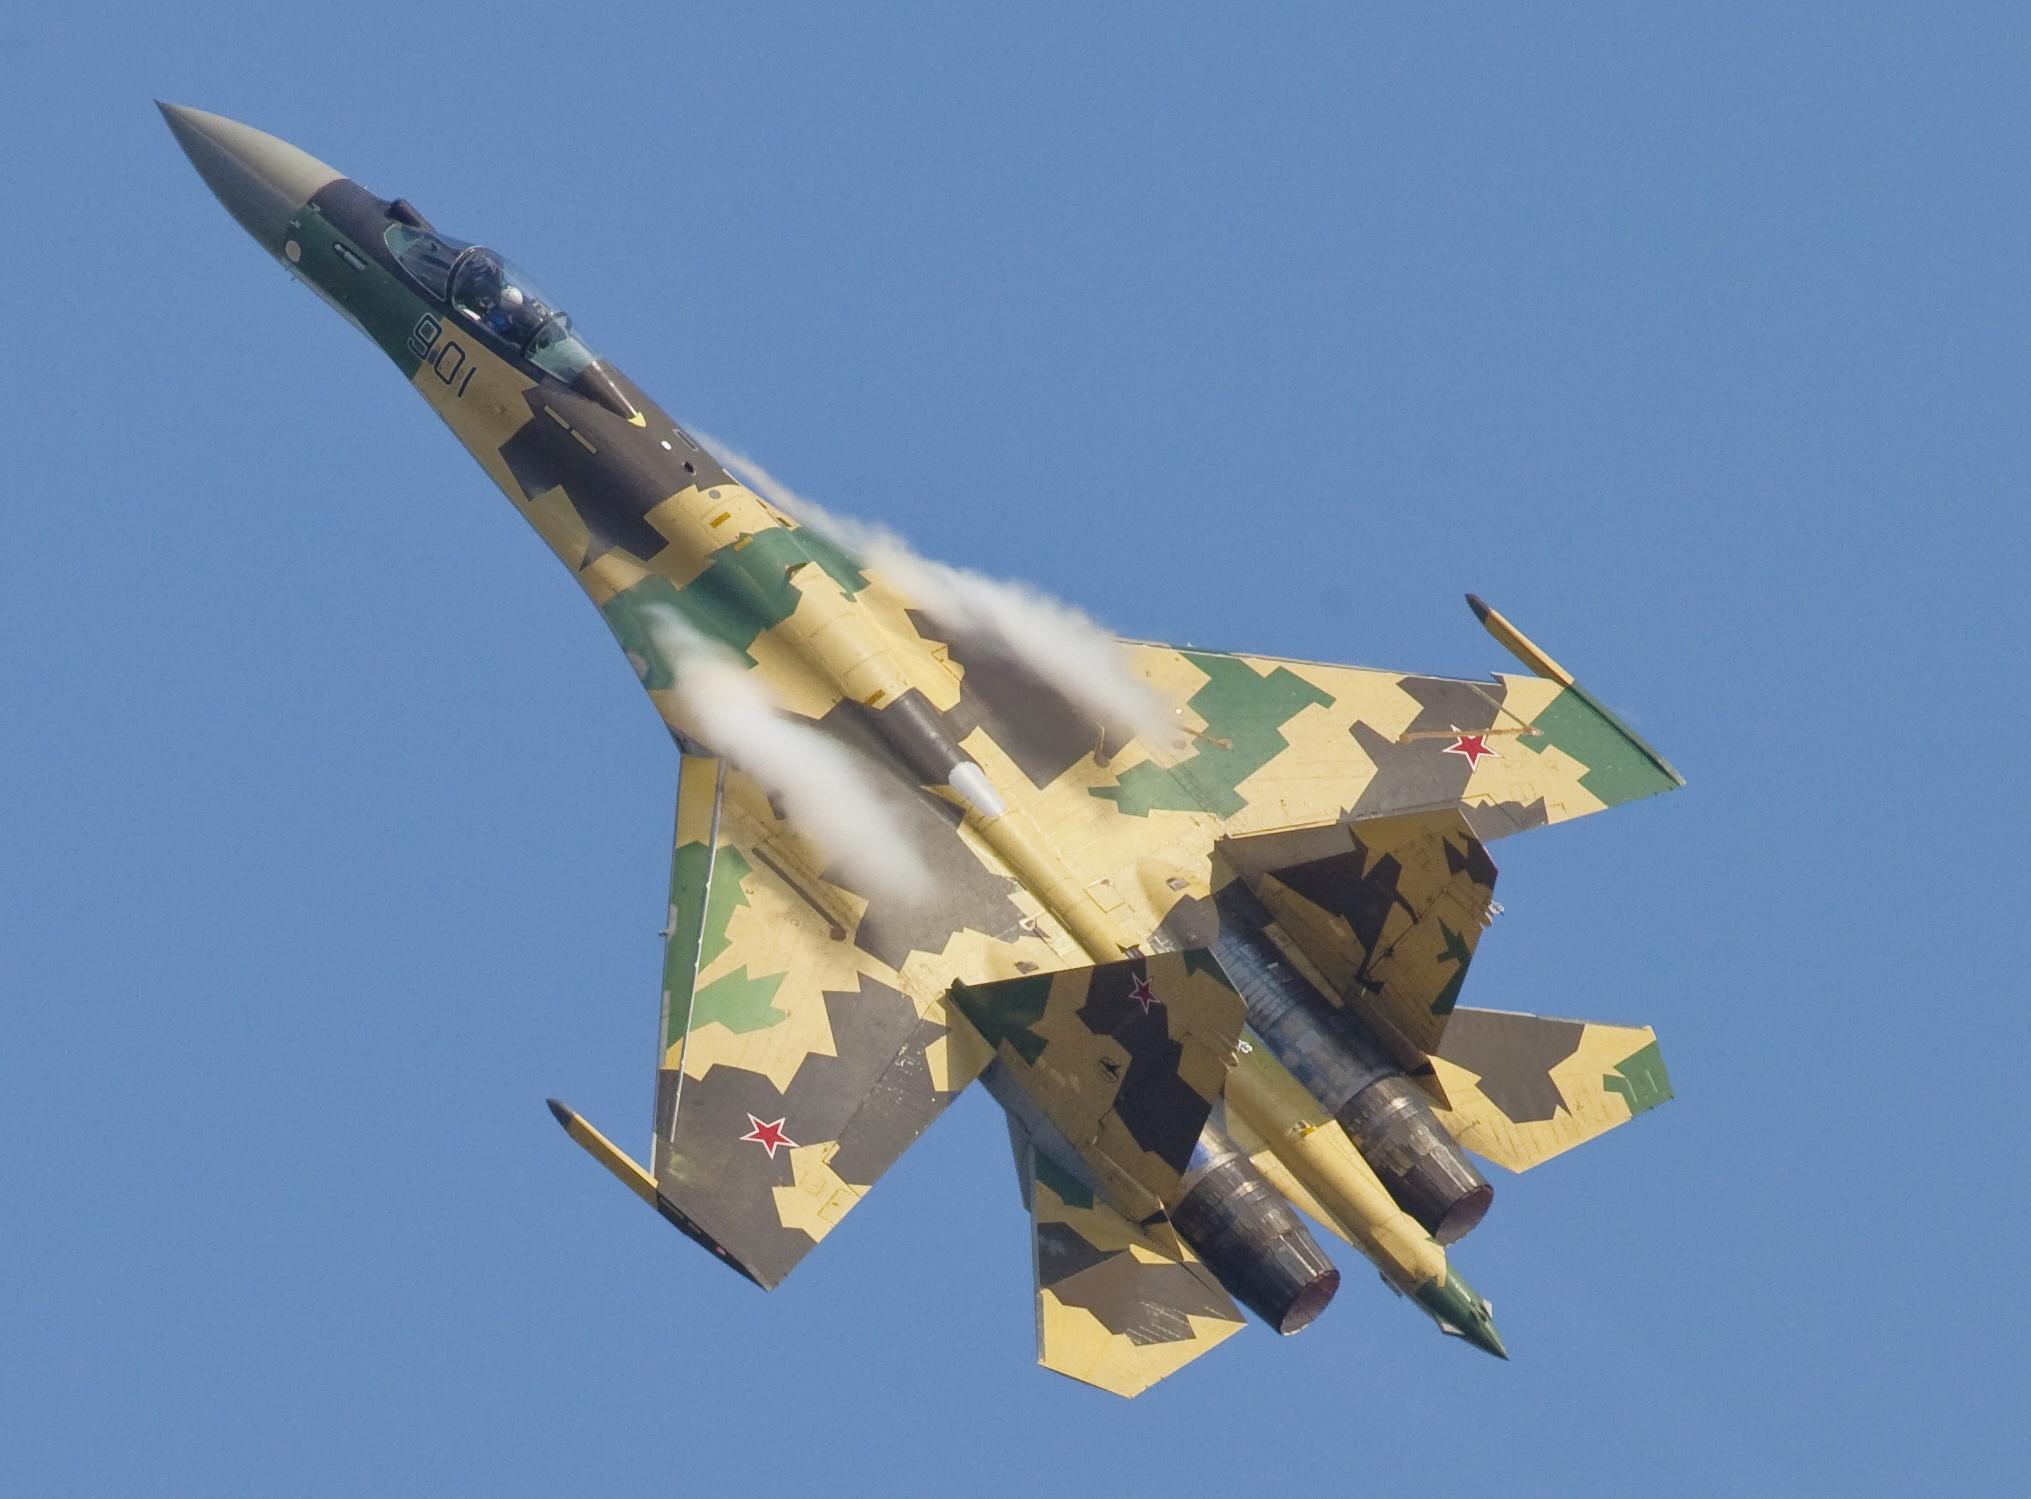 Les géants des airs : Northrop YB-49 [Italeri 1/72] - Page 3 Sukhoi_Su-35_MAKS%272011_Avdeev_%28cropped%29